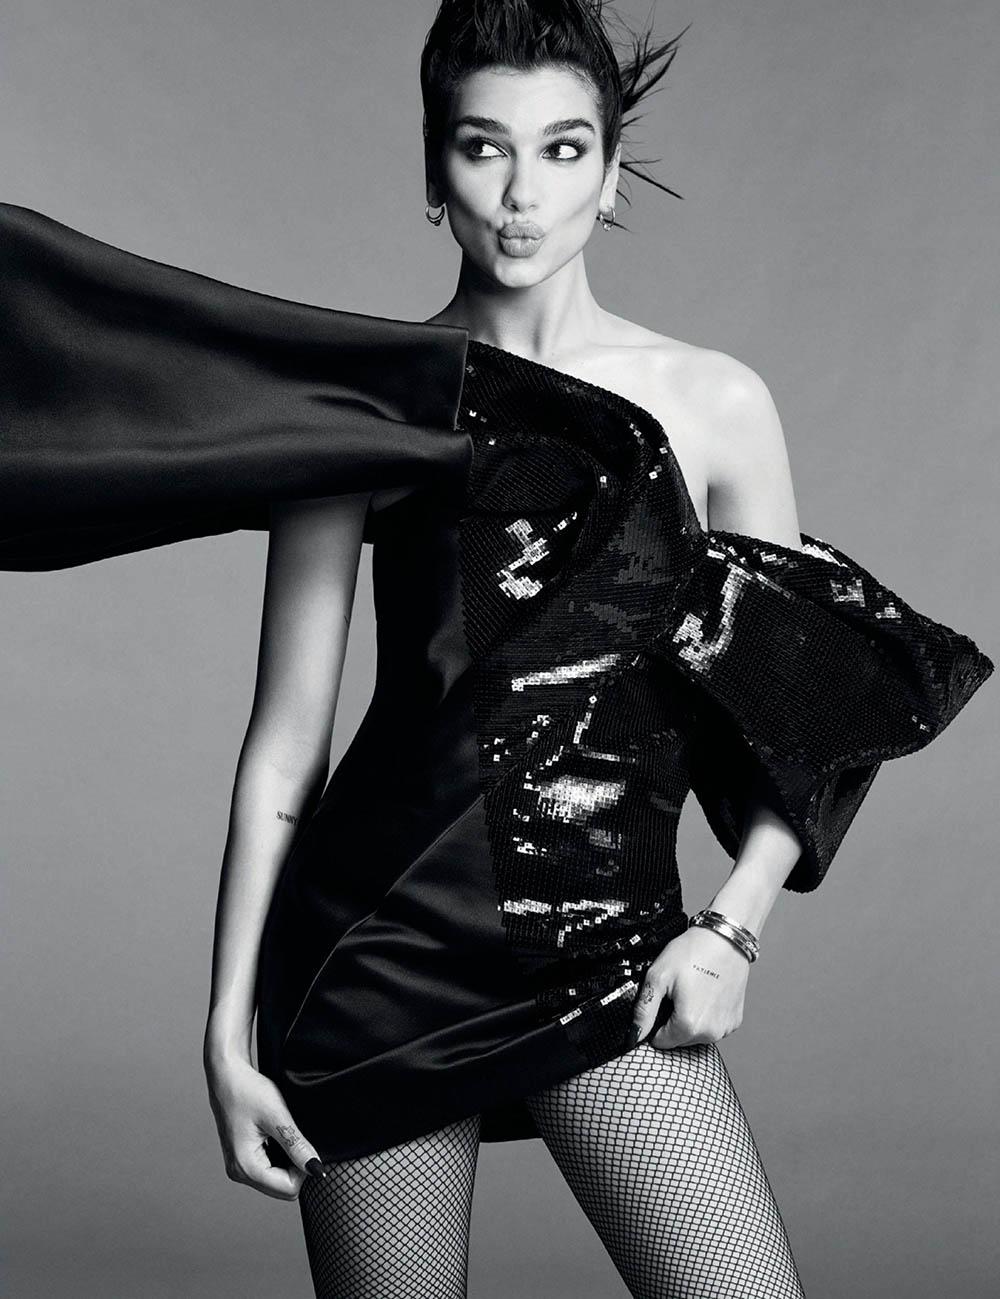 Dua Lipa covers Vogue Spain October 2019 by Luigi & Iango